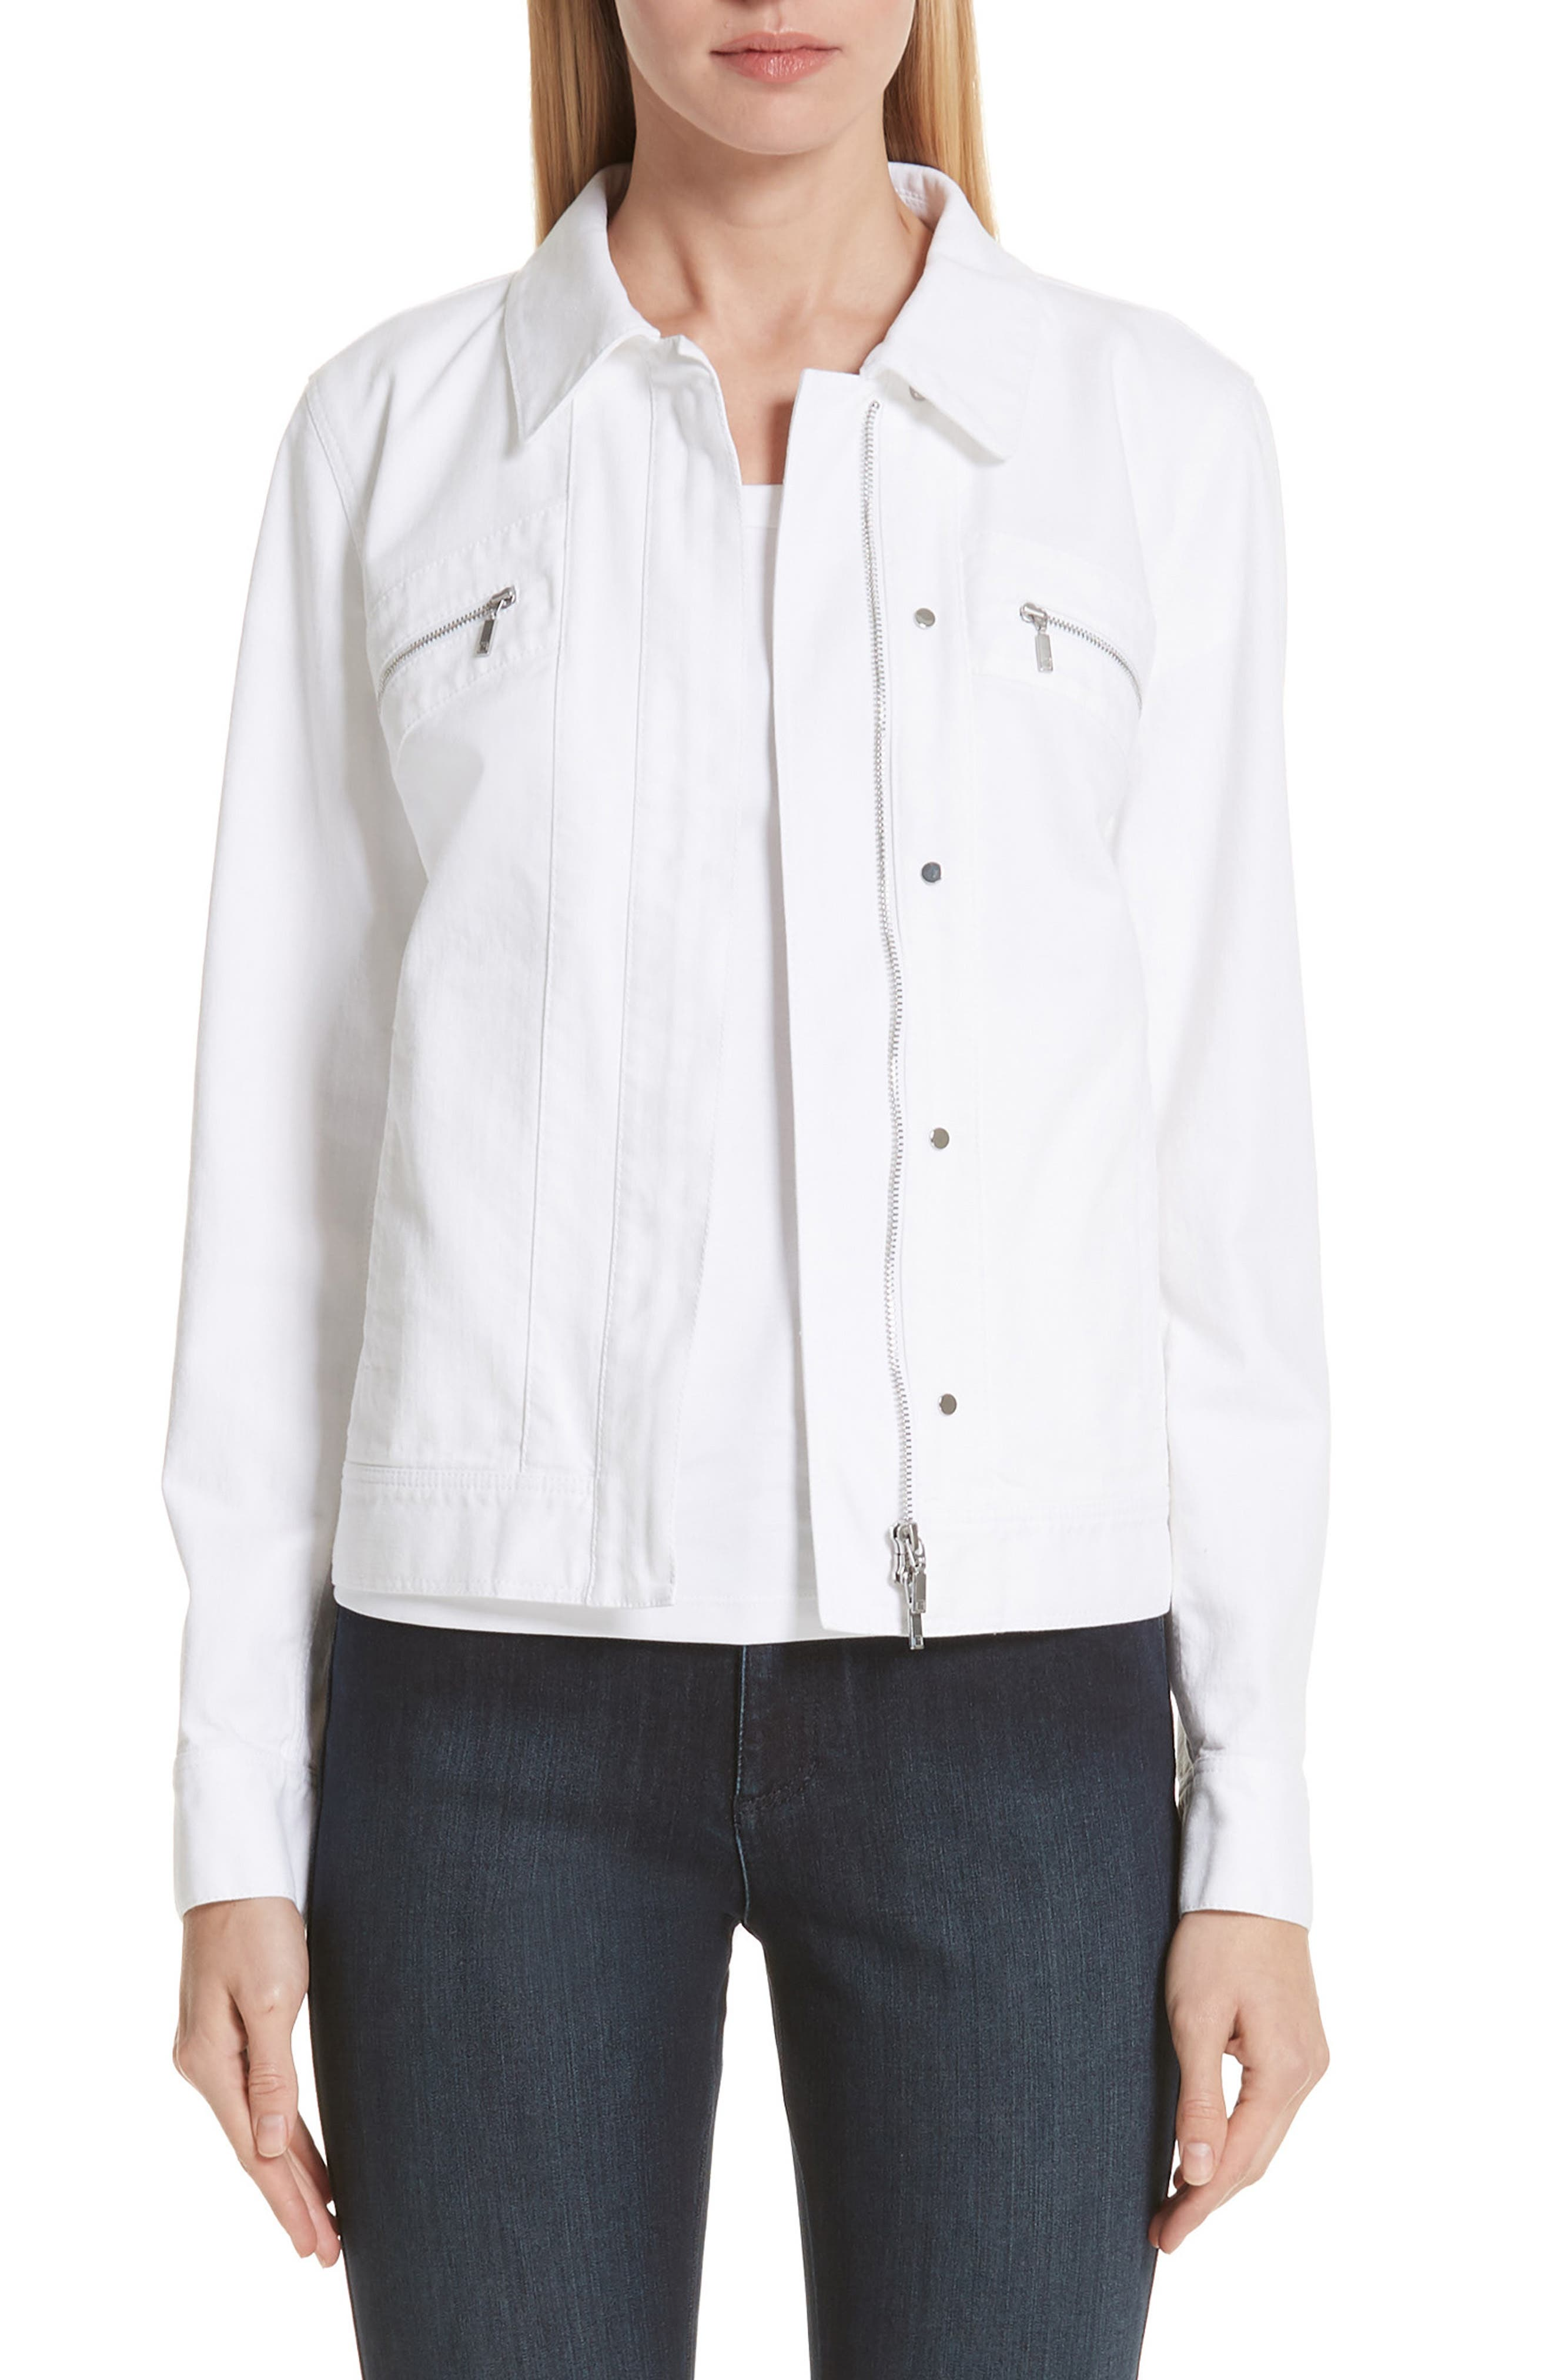 LAFAYETTE 148 NEW YORK Kesha Denim Jacket, Main, color, 100